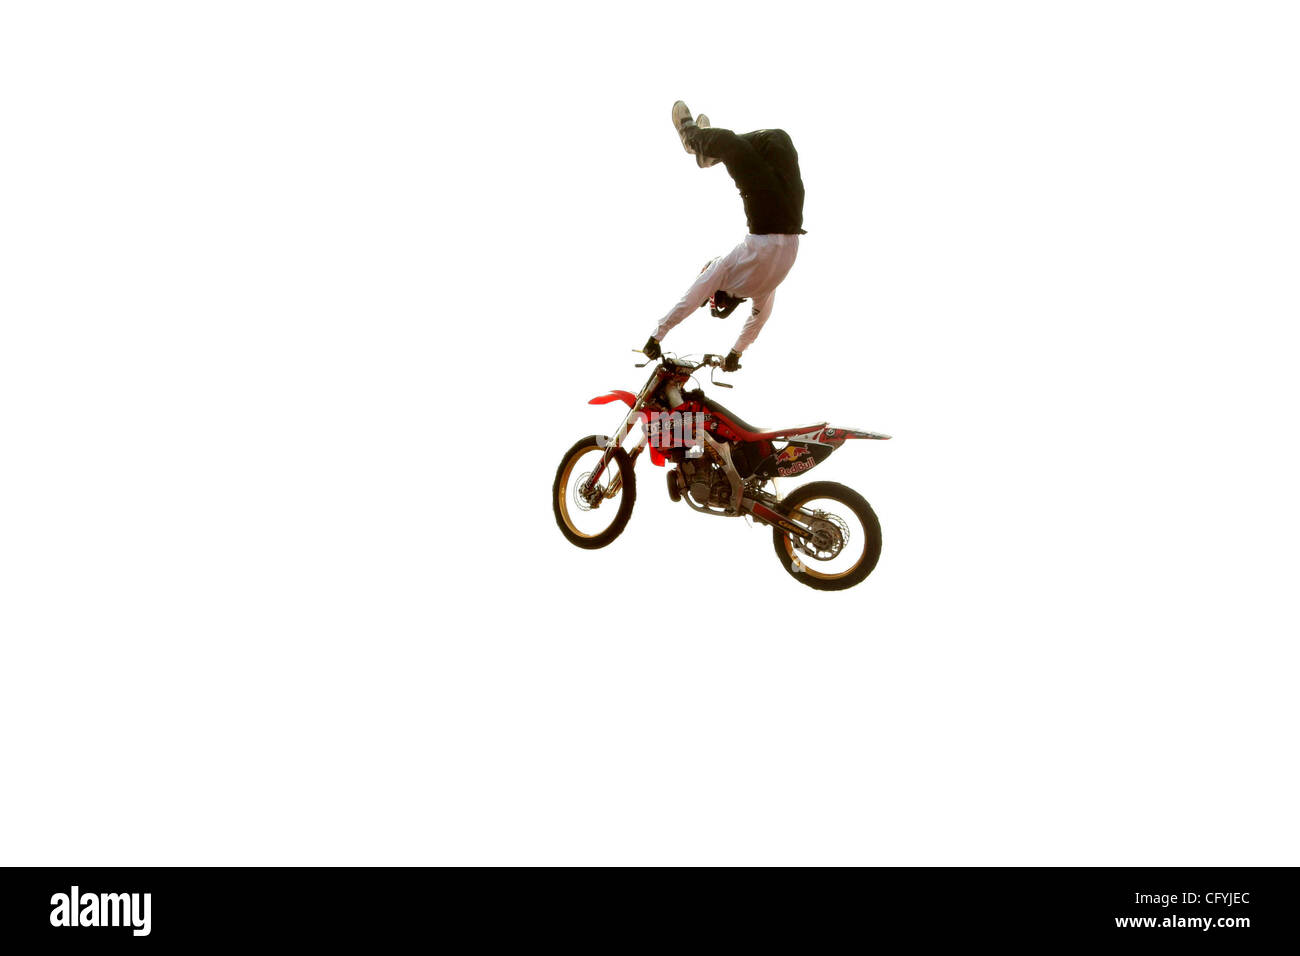 May 20, 2007; Hollywood, California, USA;  Freestyle Motorcross/Stuntman ROBBIE MADDISON riding his motorbike over - Stock Image